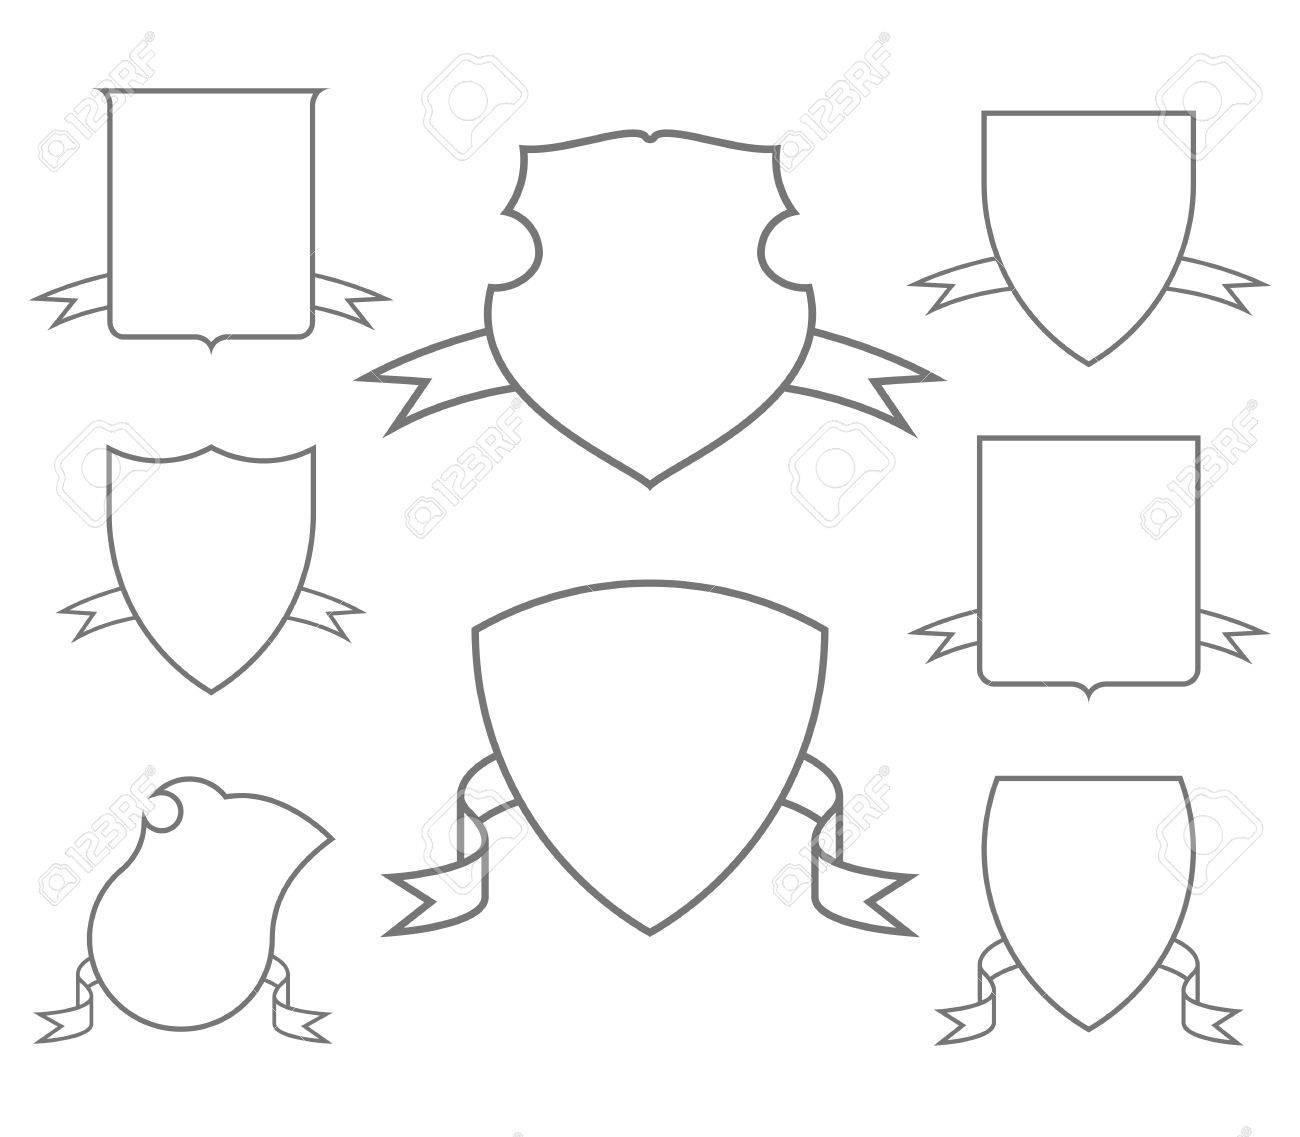 Vektorgrafiken Wappen Vektorbilder Wappen Depositphotos 11